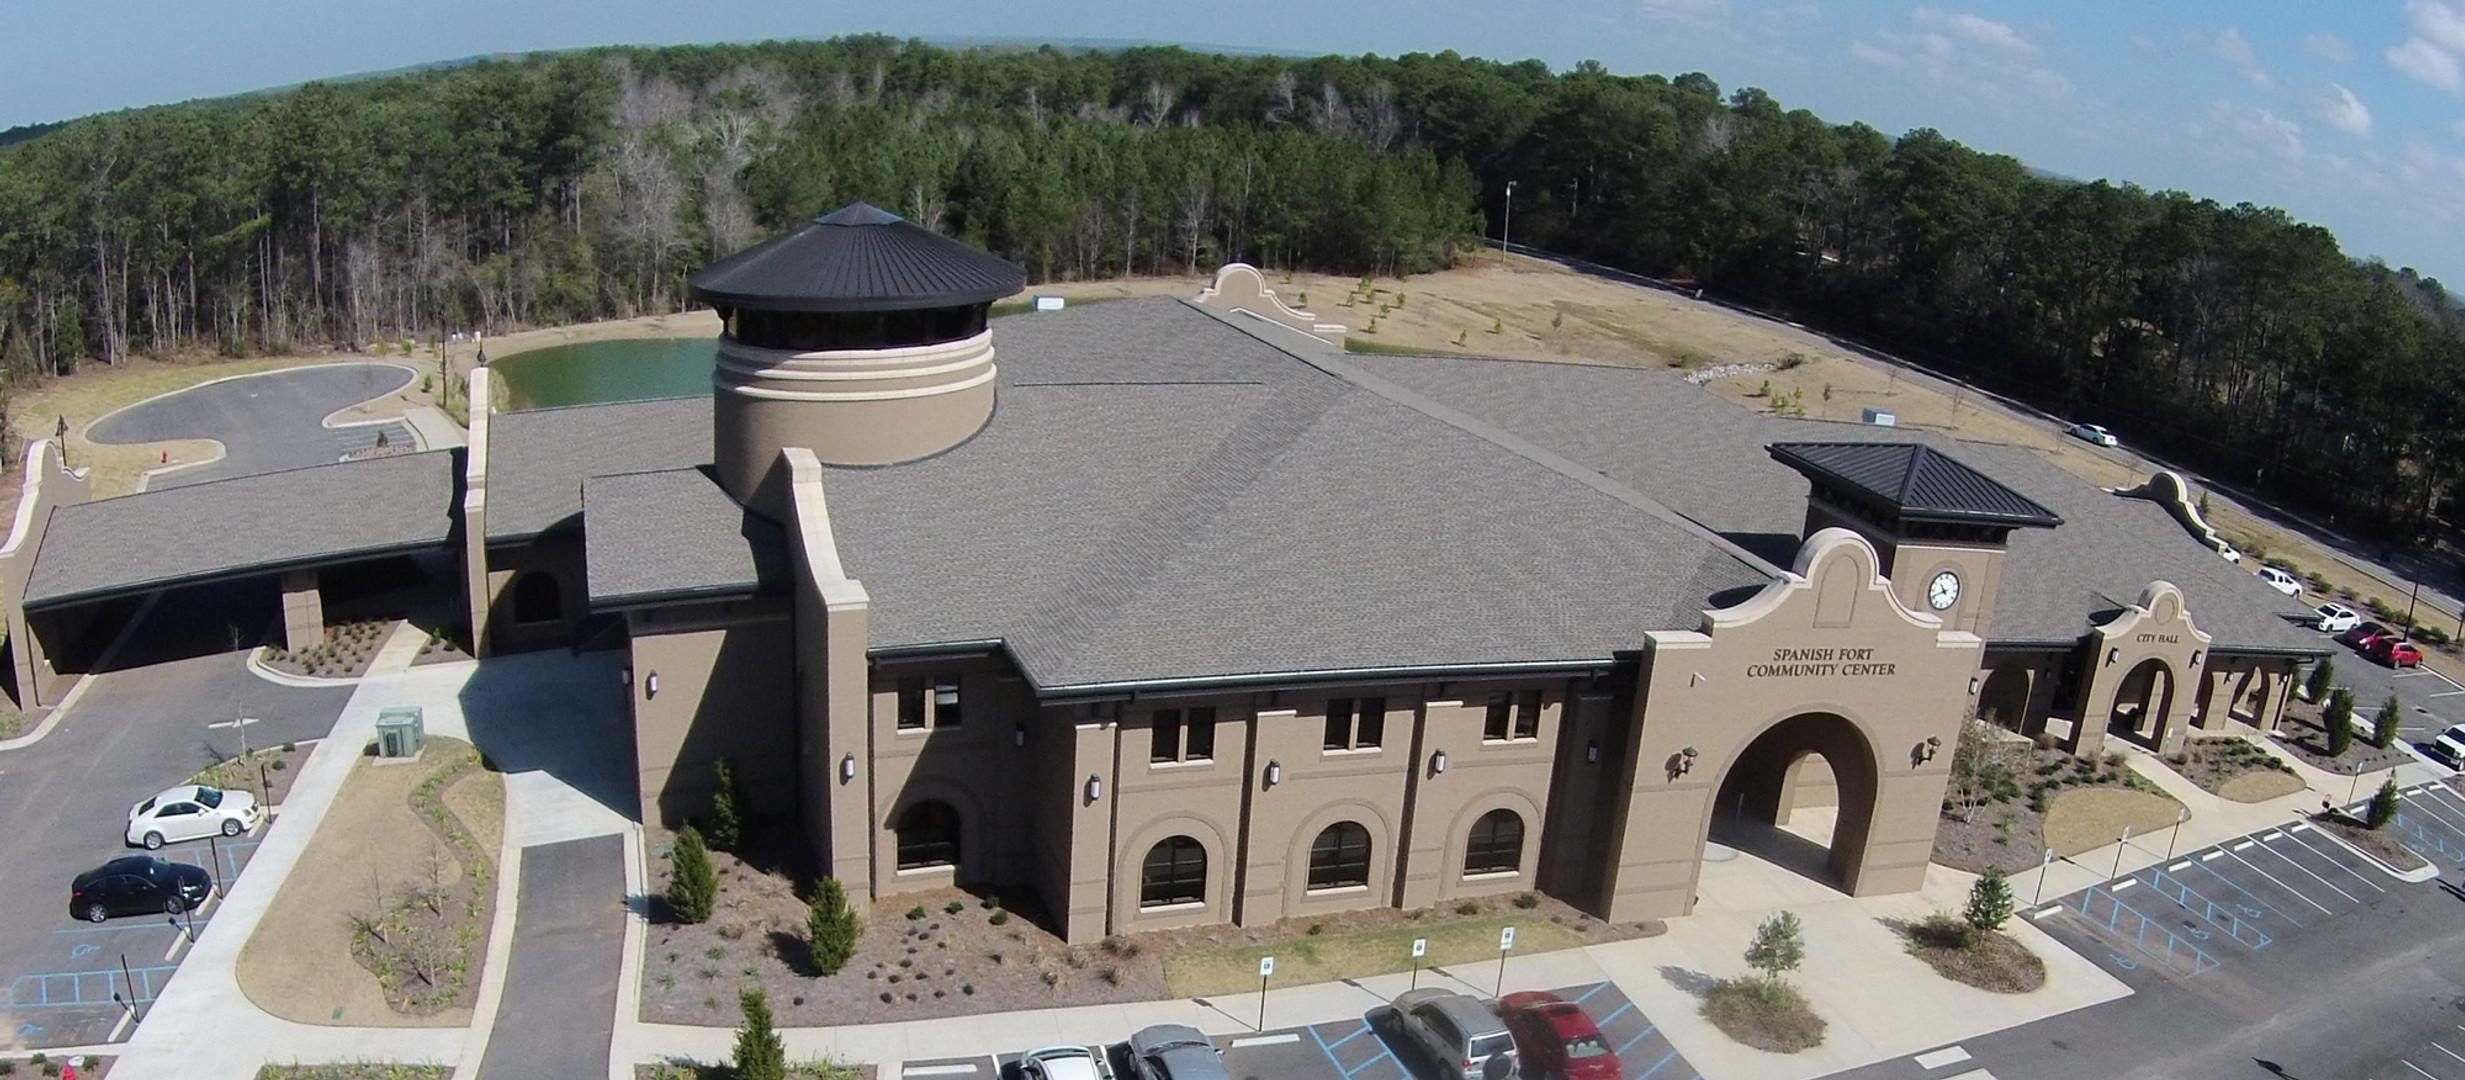 aerial shot of spanish fort community center